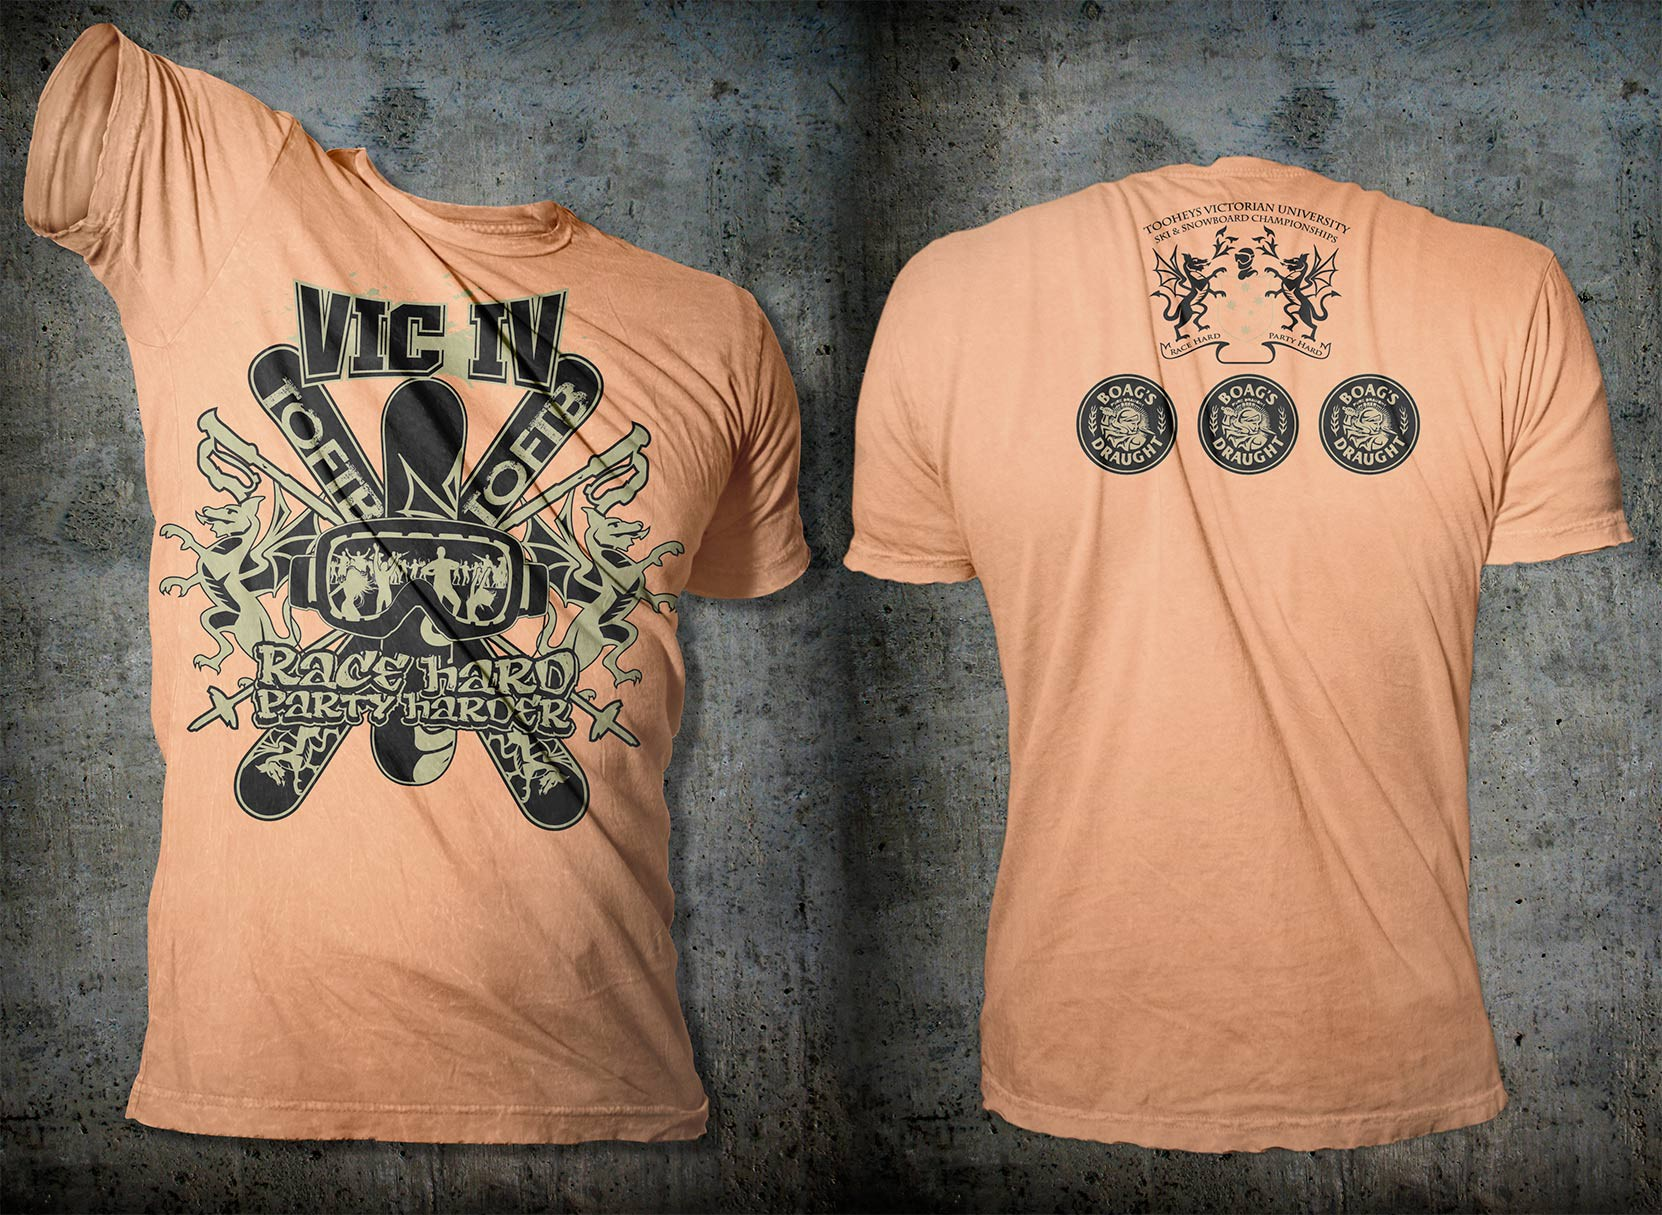 2012 Vic IV T-Shirt